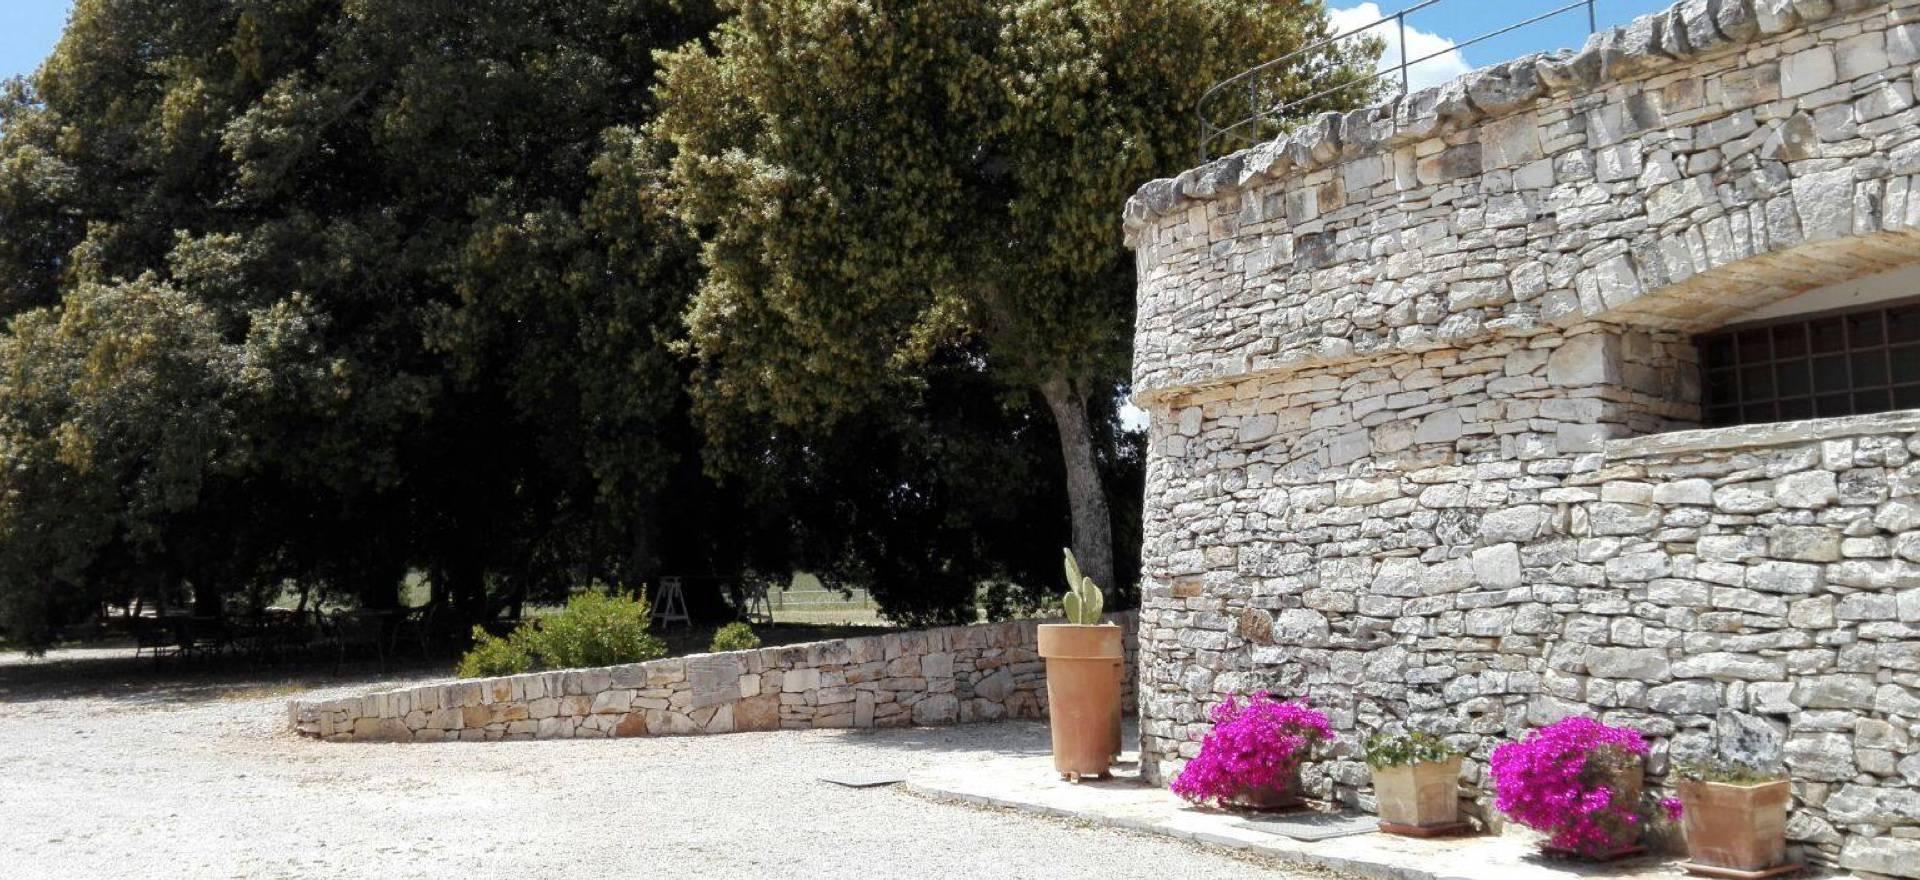 Agriturismo Apulien Agriturismo in ruhiger Lage in der Landschaft von Apulien